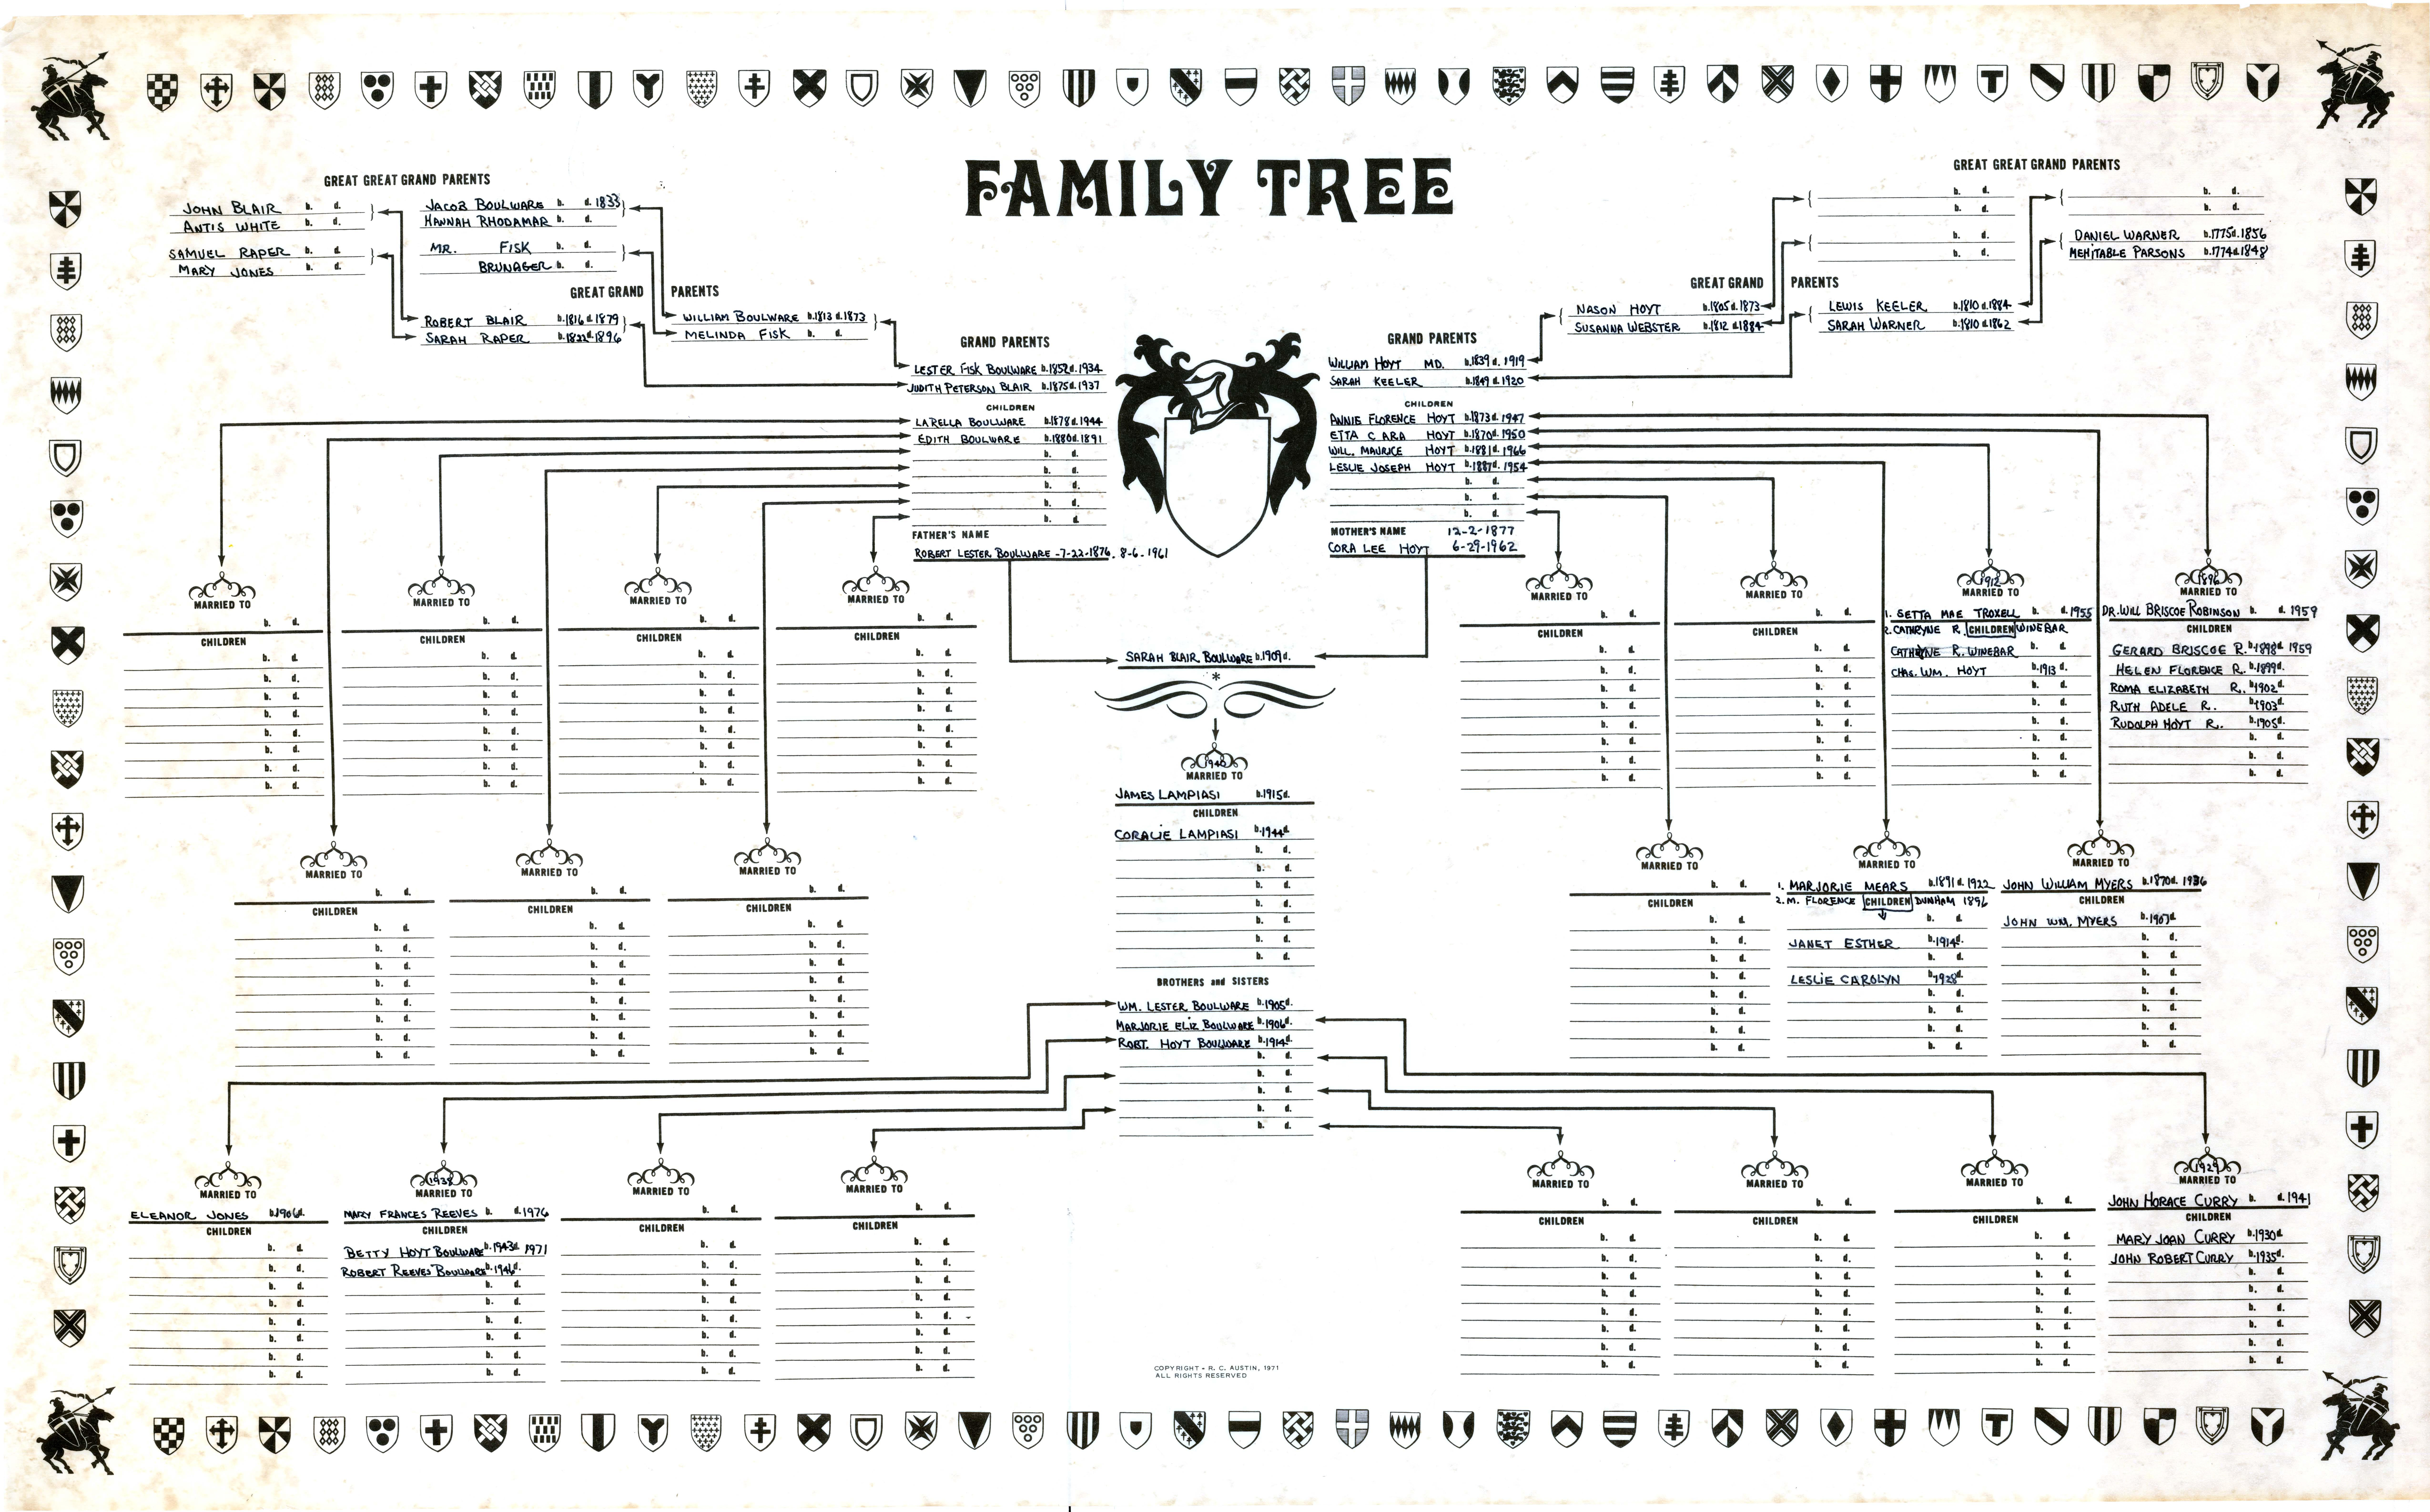 Family Tree (PDF - 547 KB)